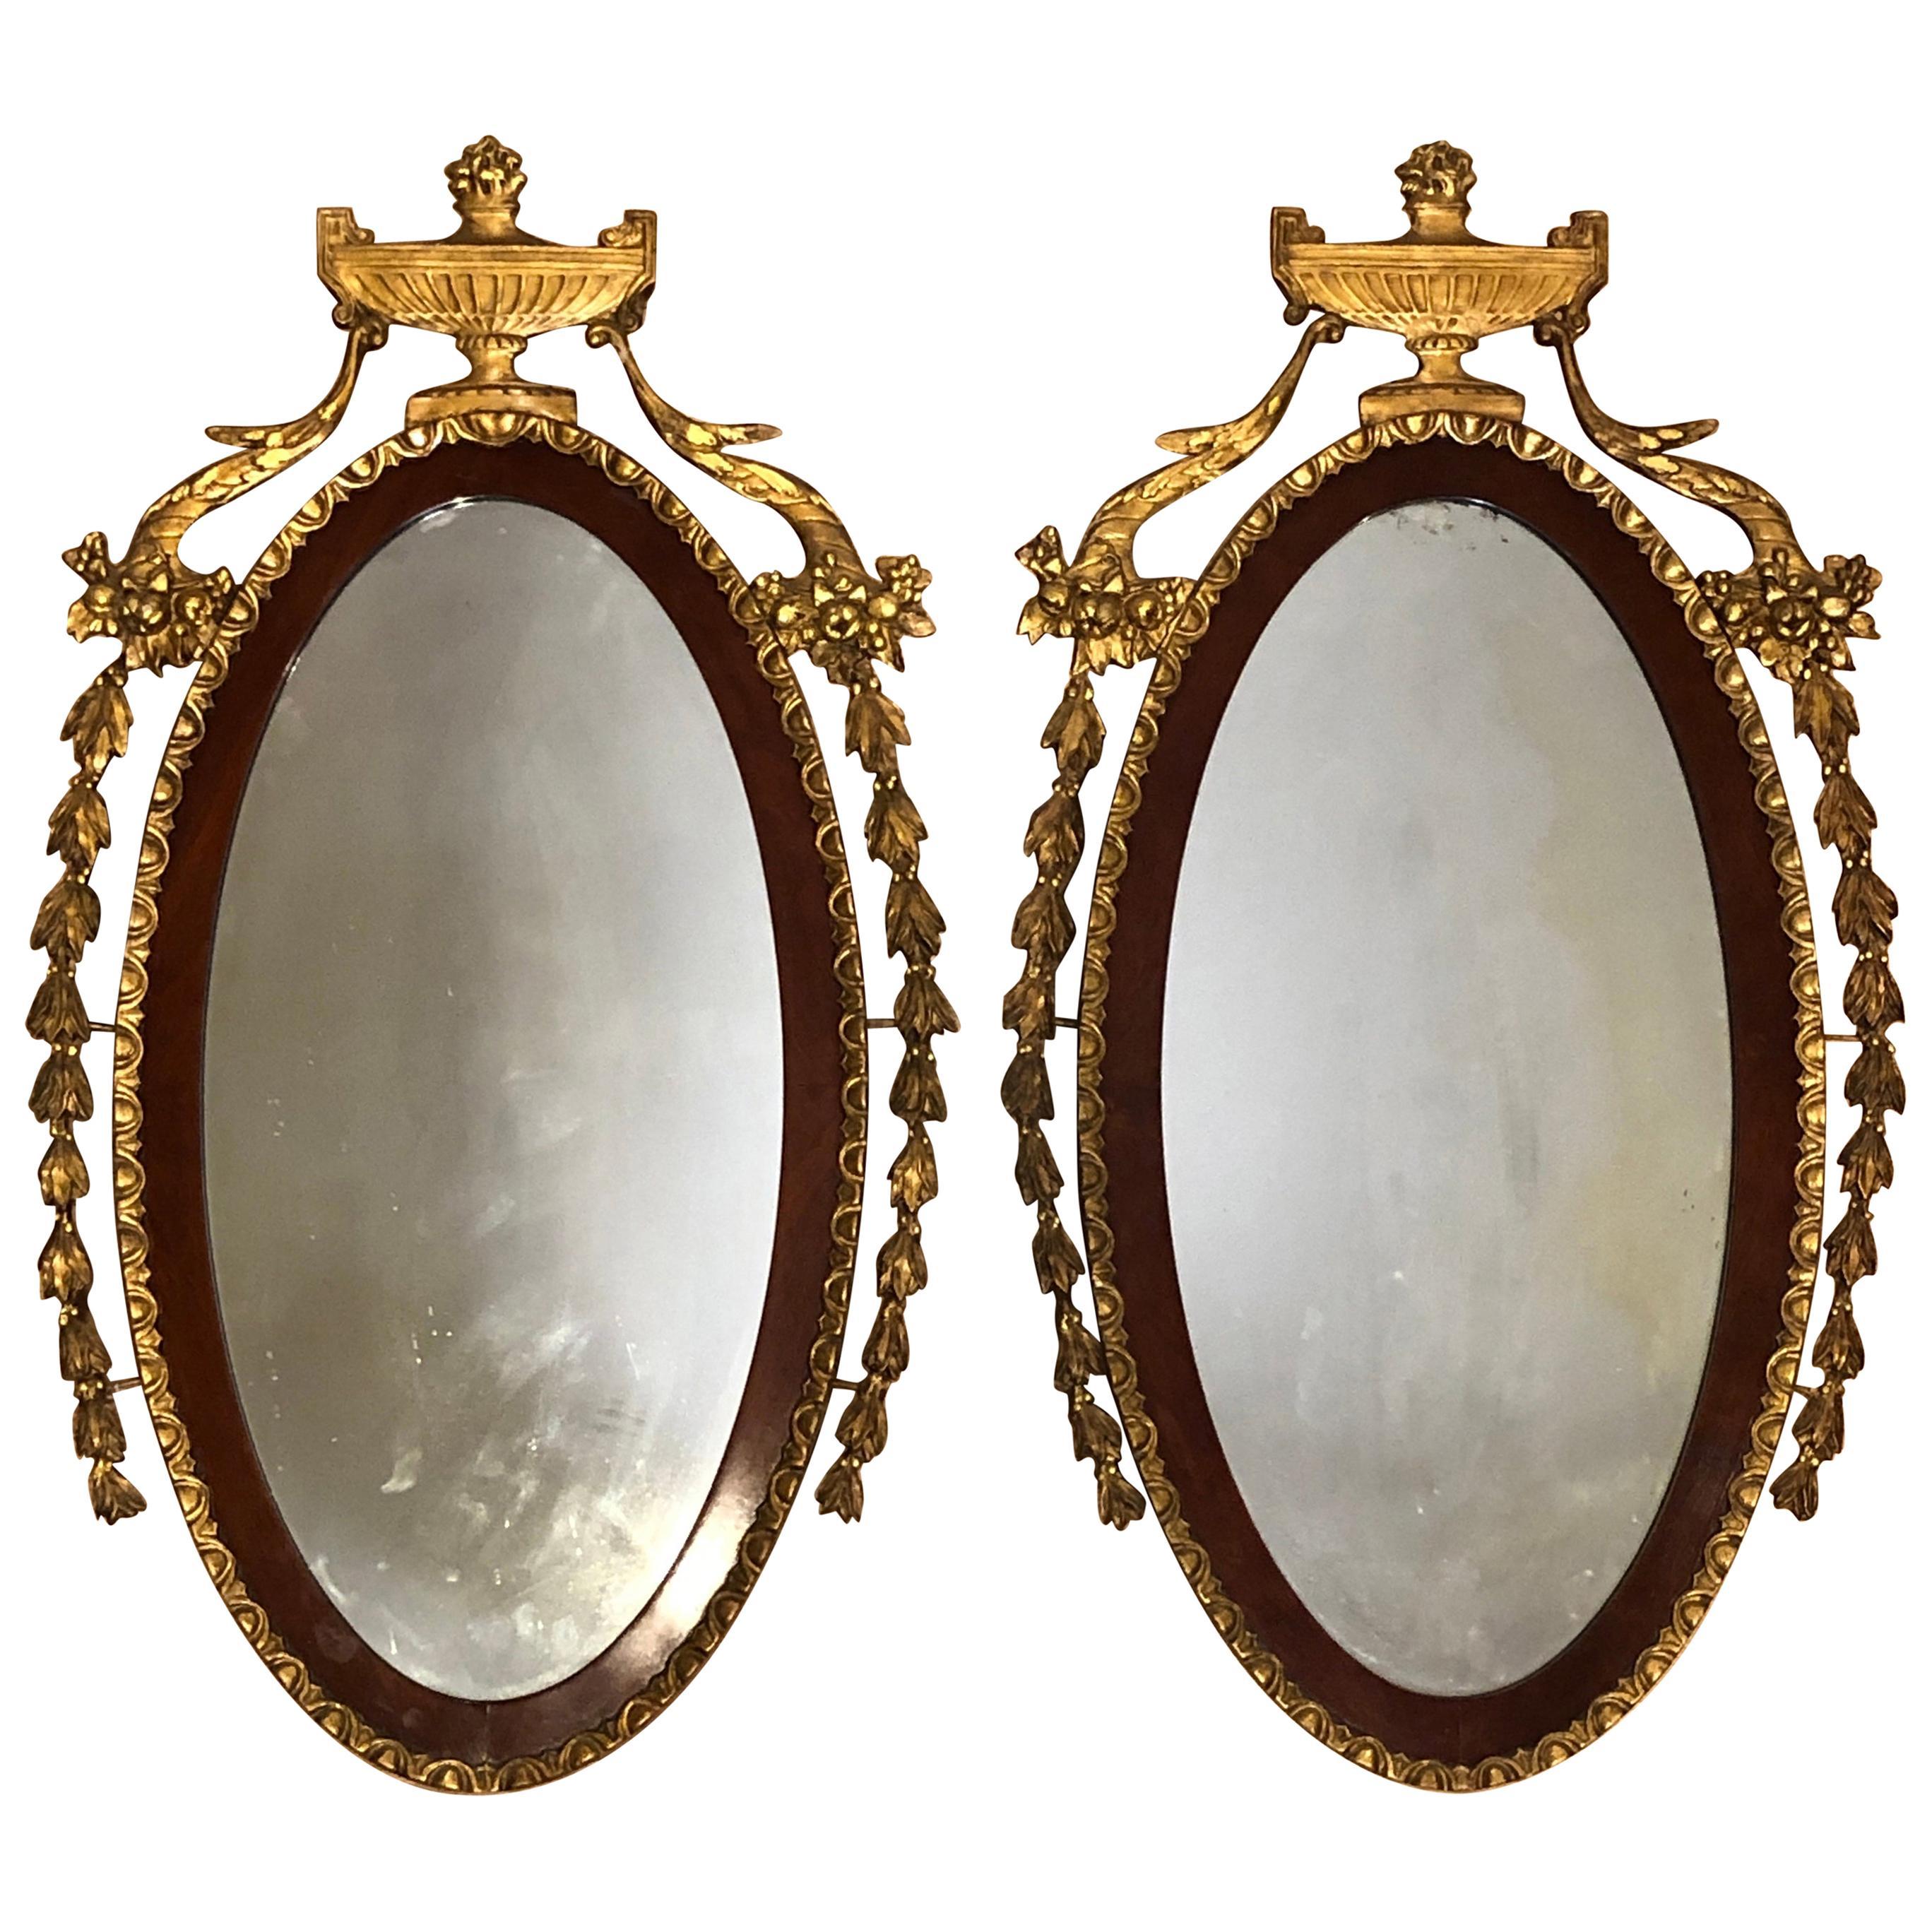 Pair of 19th Century Adam Style Giltwood Mirrors